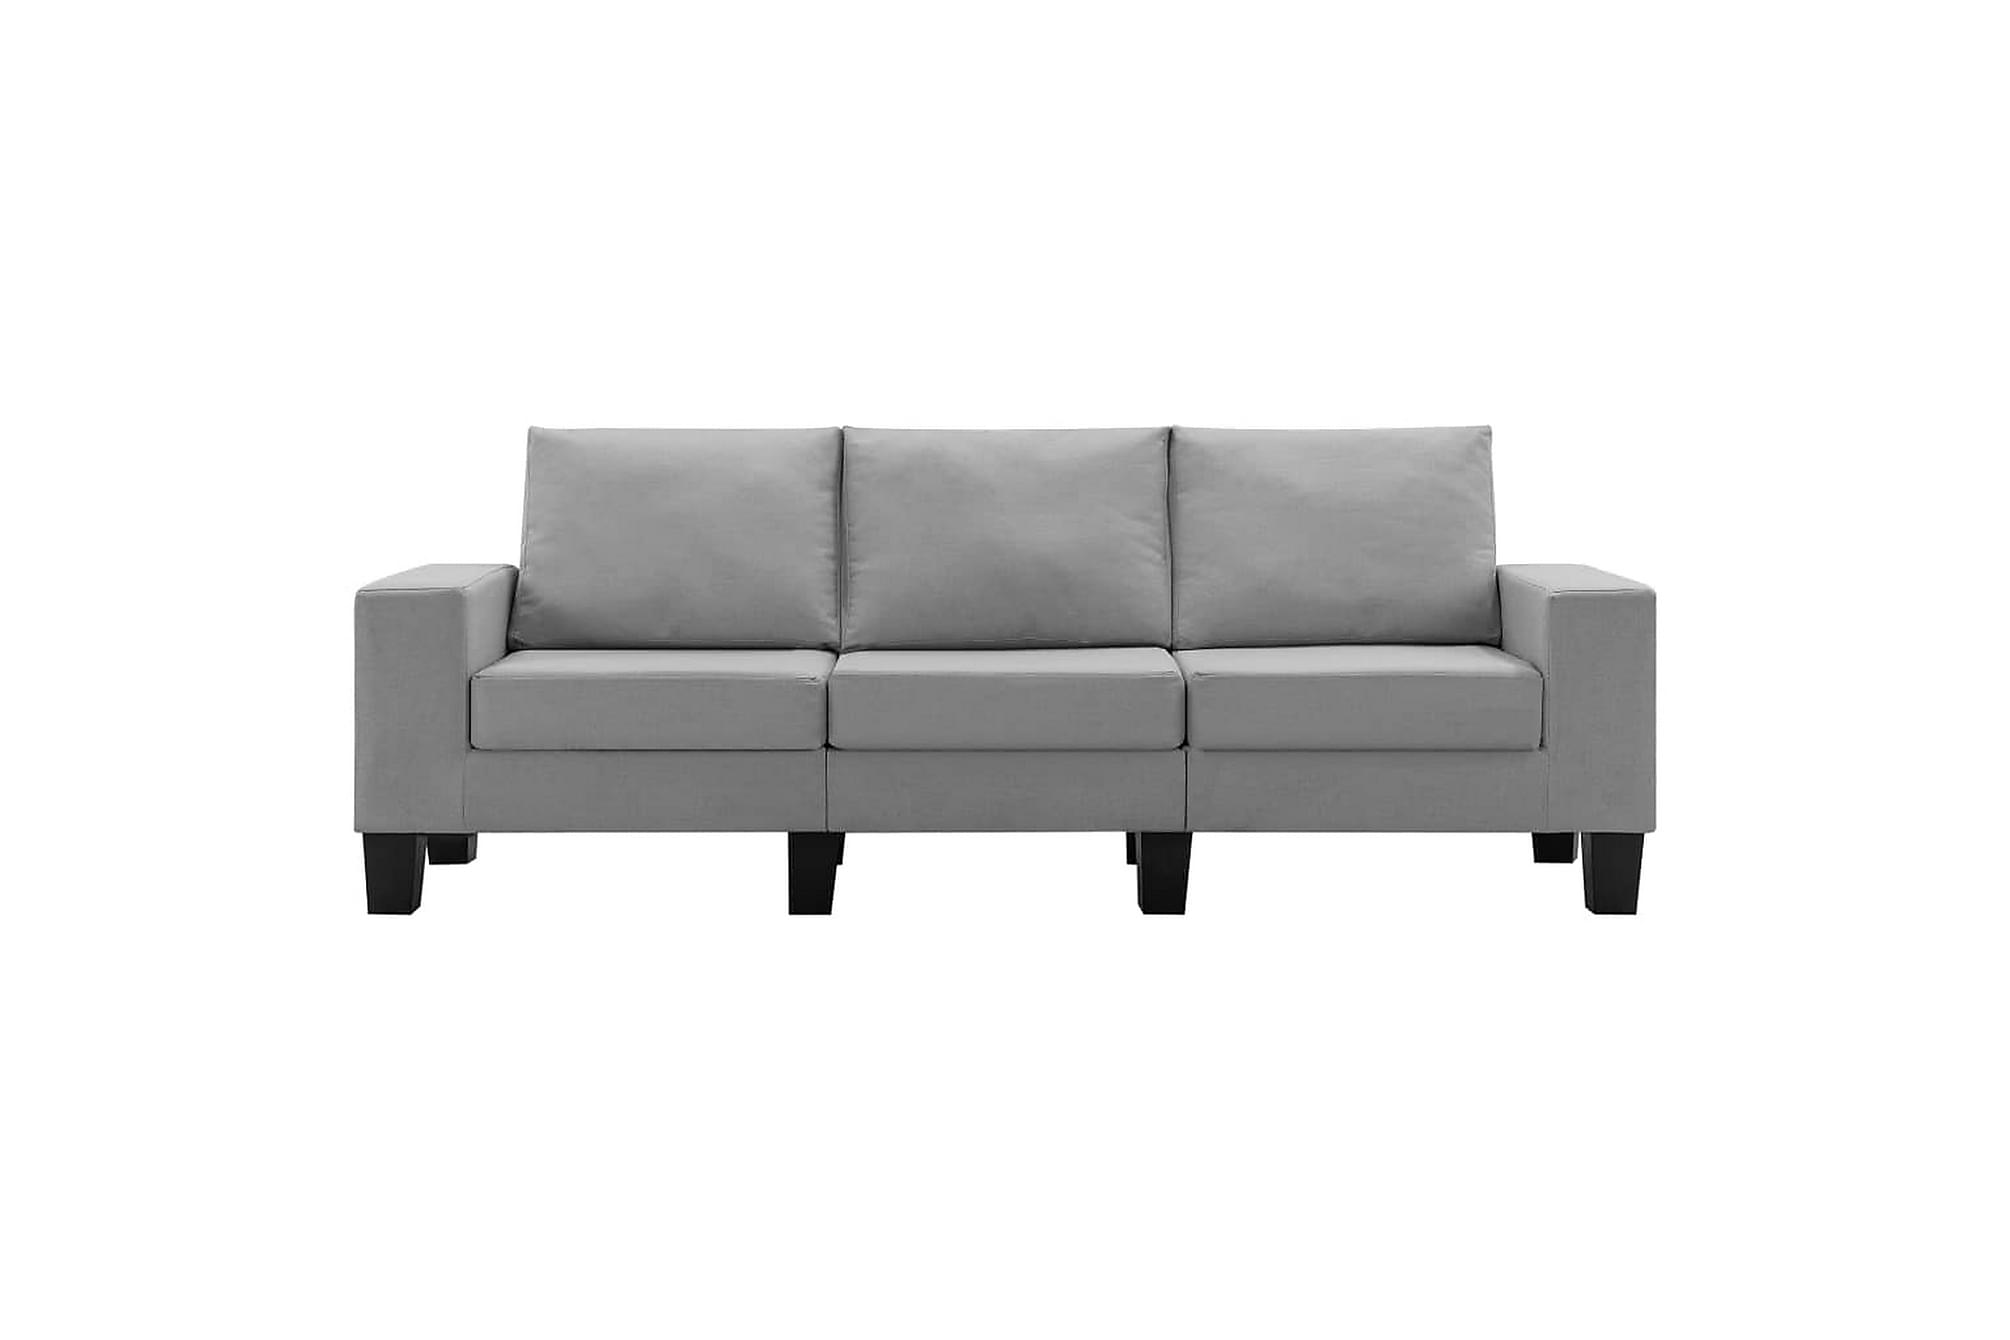 3-sitssoffa ljusgrå tyg, Soffor